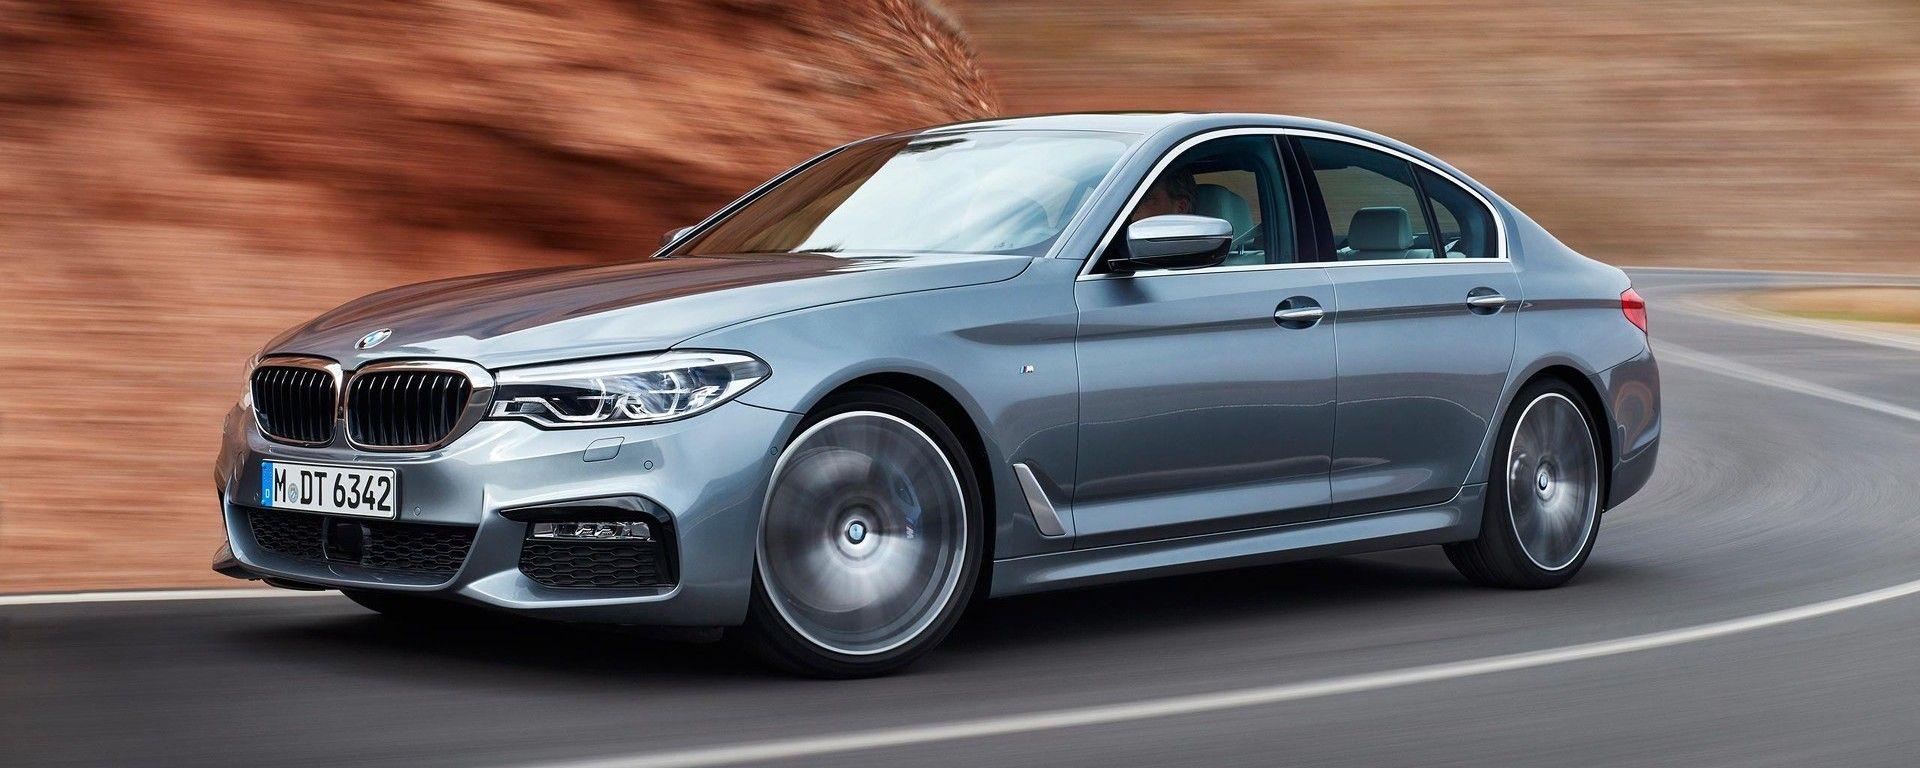 Nuova BMW Serie 5: prova, dotazioni, prezzi